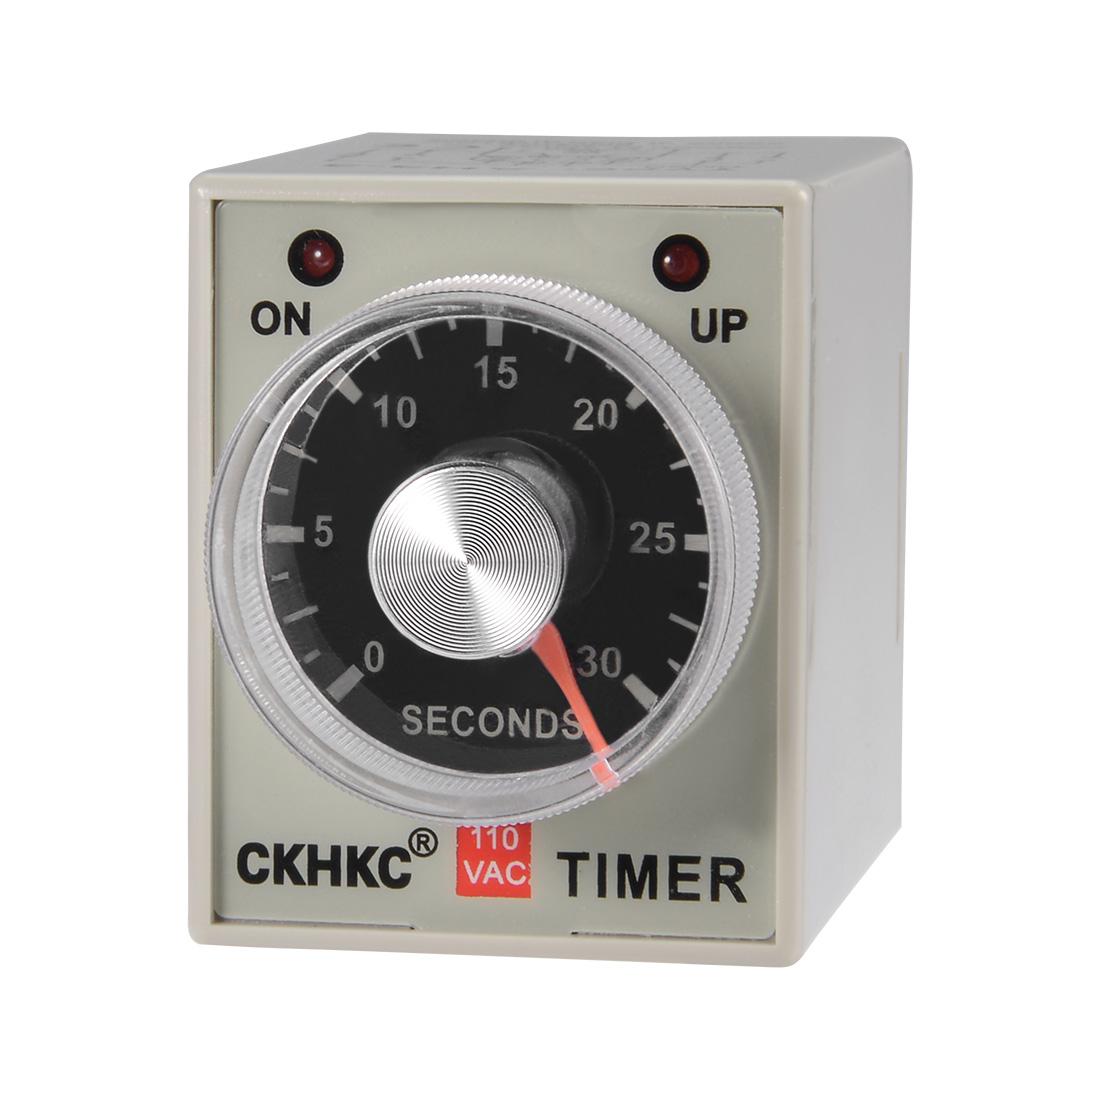 AC110V 30S 8 Terminals Range Adjustable Delay Timer Time Relay AH3-3